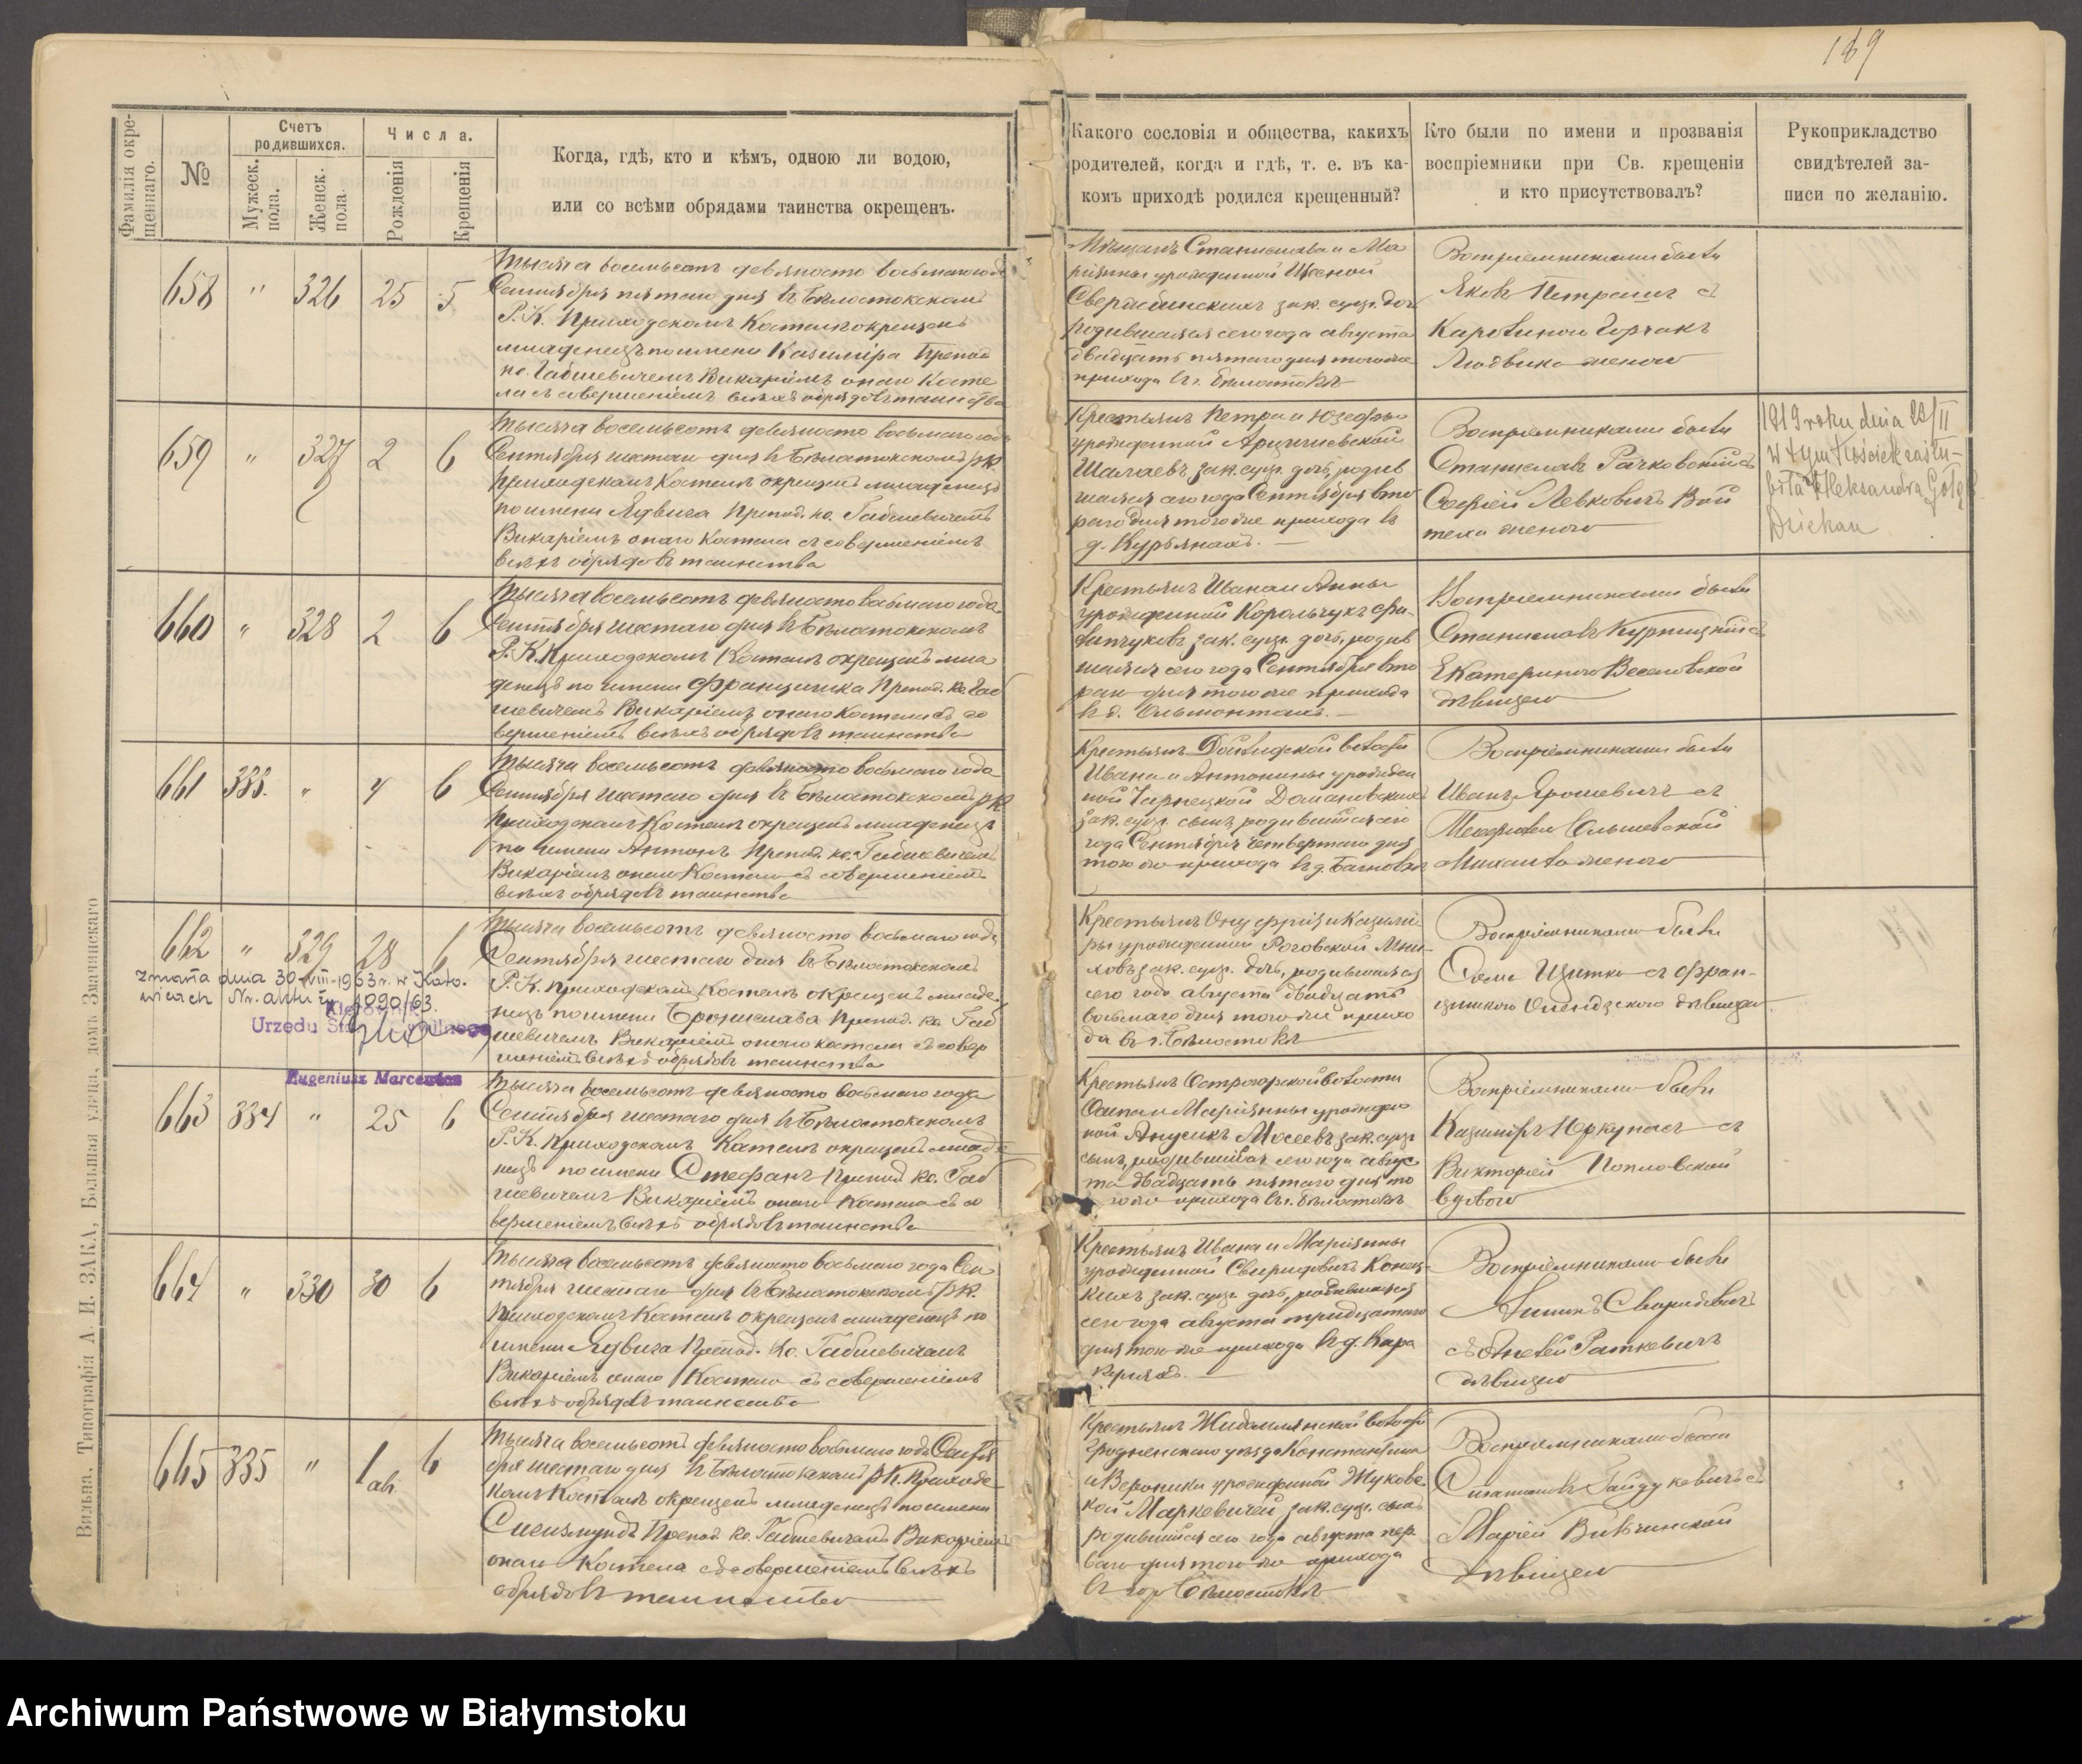 Skan z jednostki: [Akta urodzeń za lata 1897-1898]